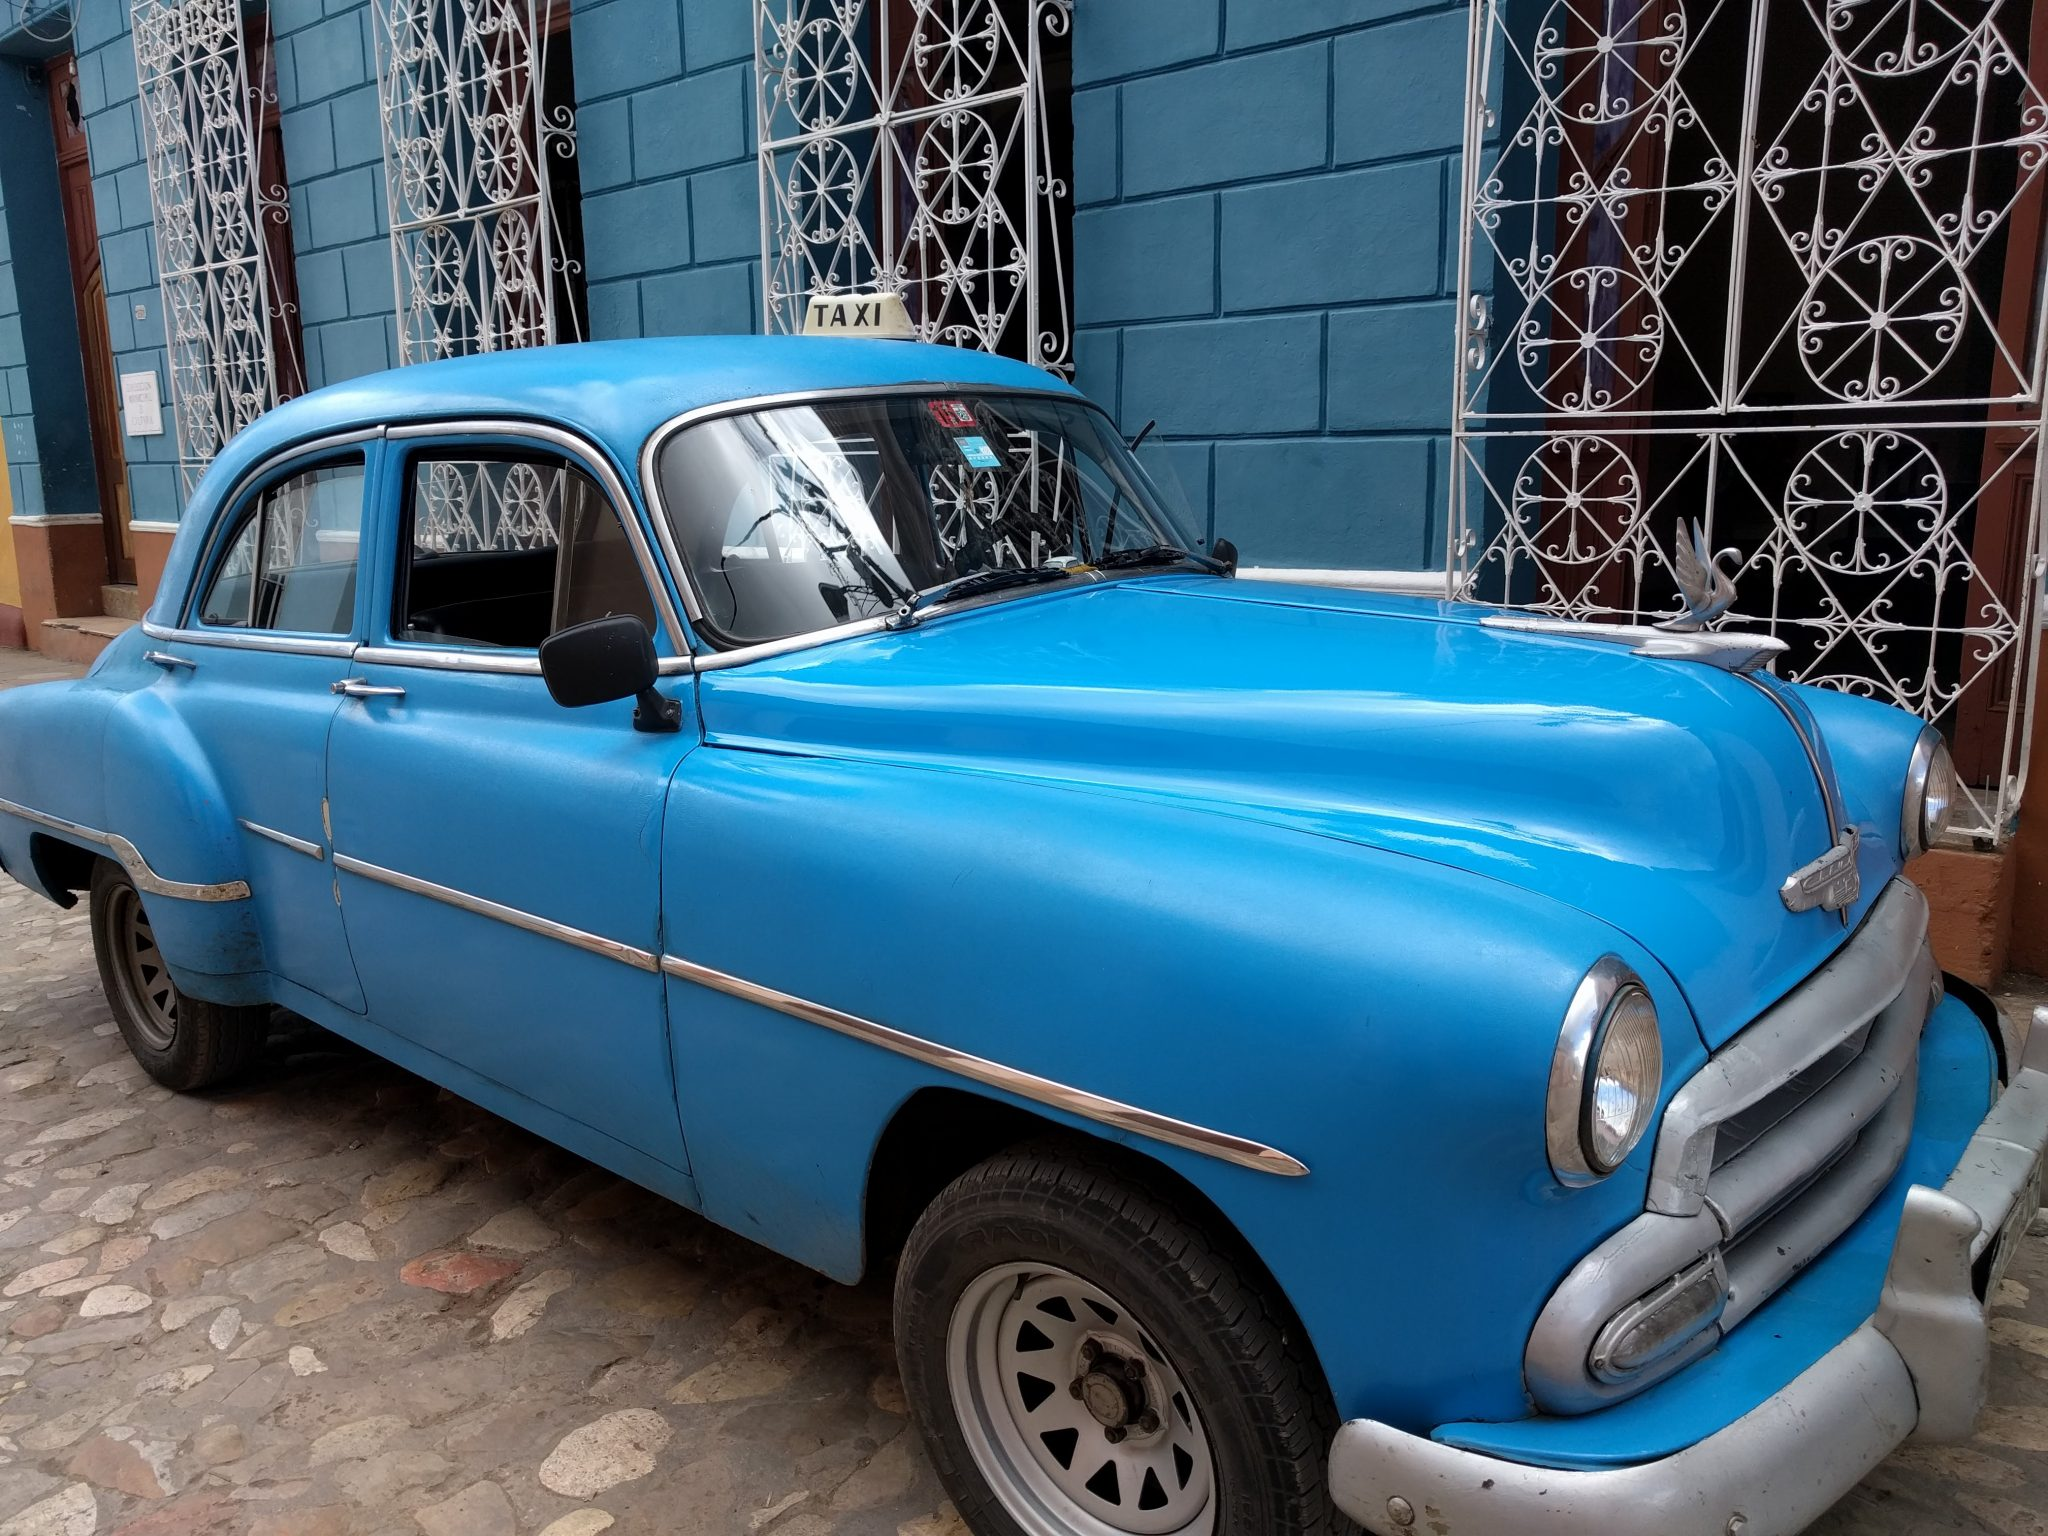 muoversi a Cuba